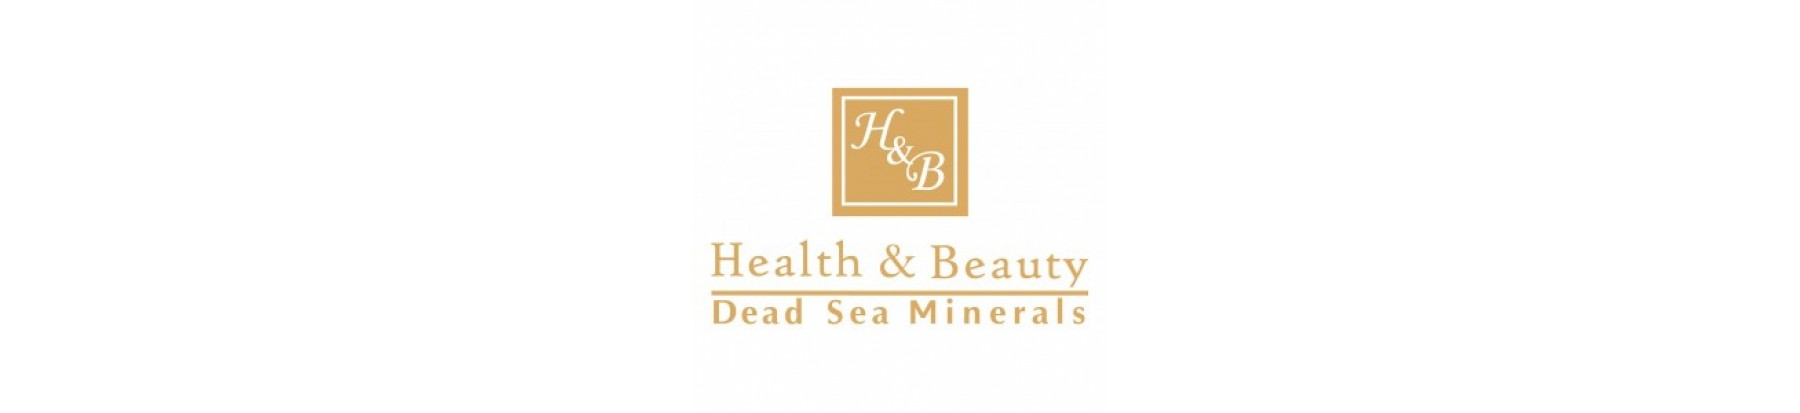 СПА косметика H.B.Health&Beauty